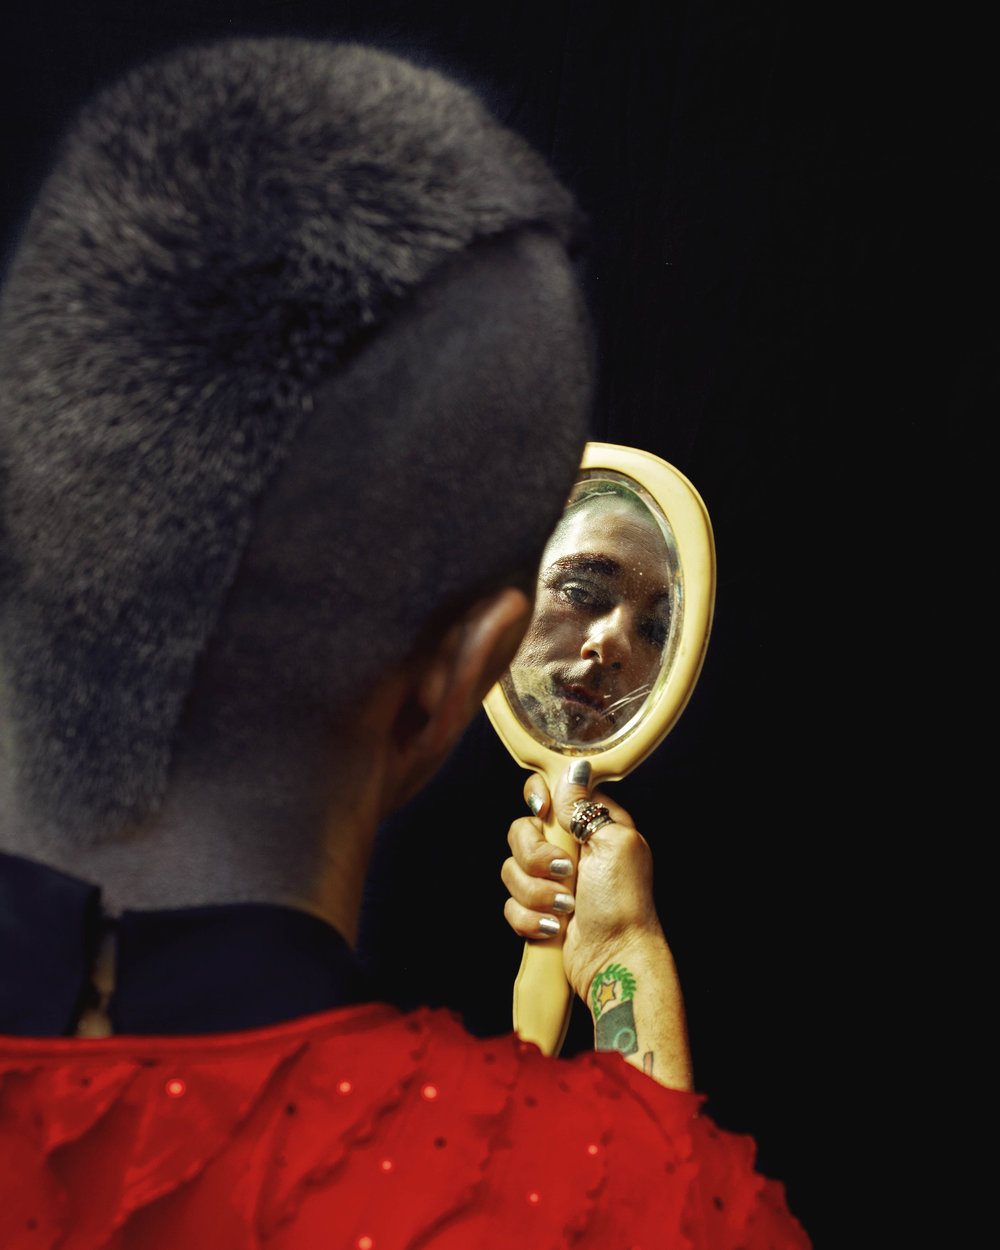 makeup-mirror-by-ransom-ashley-4.jpg